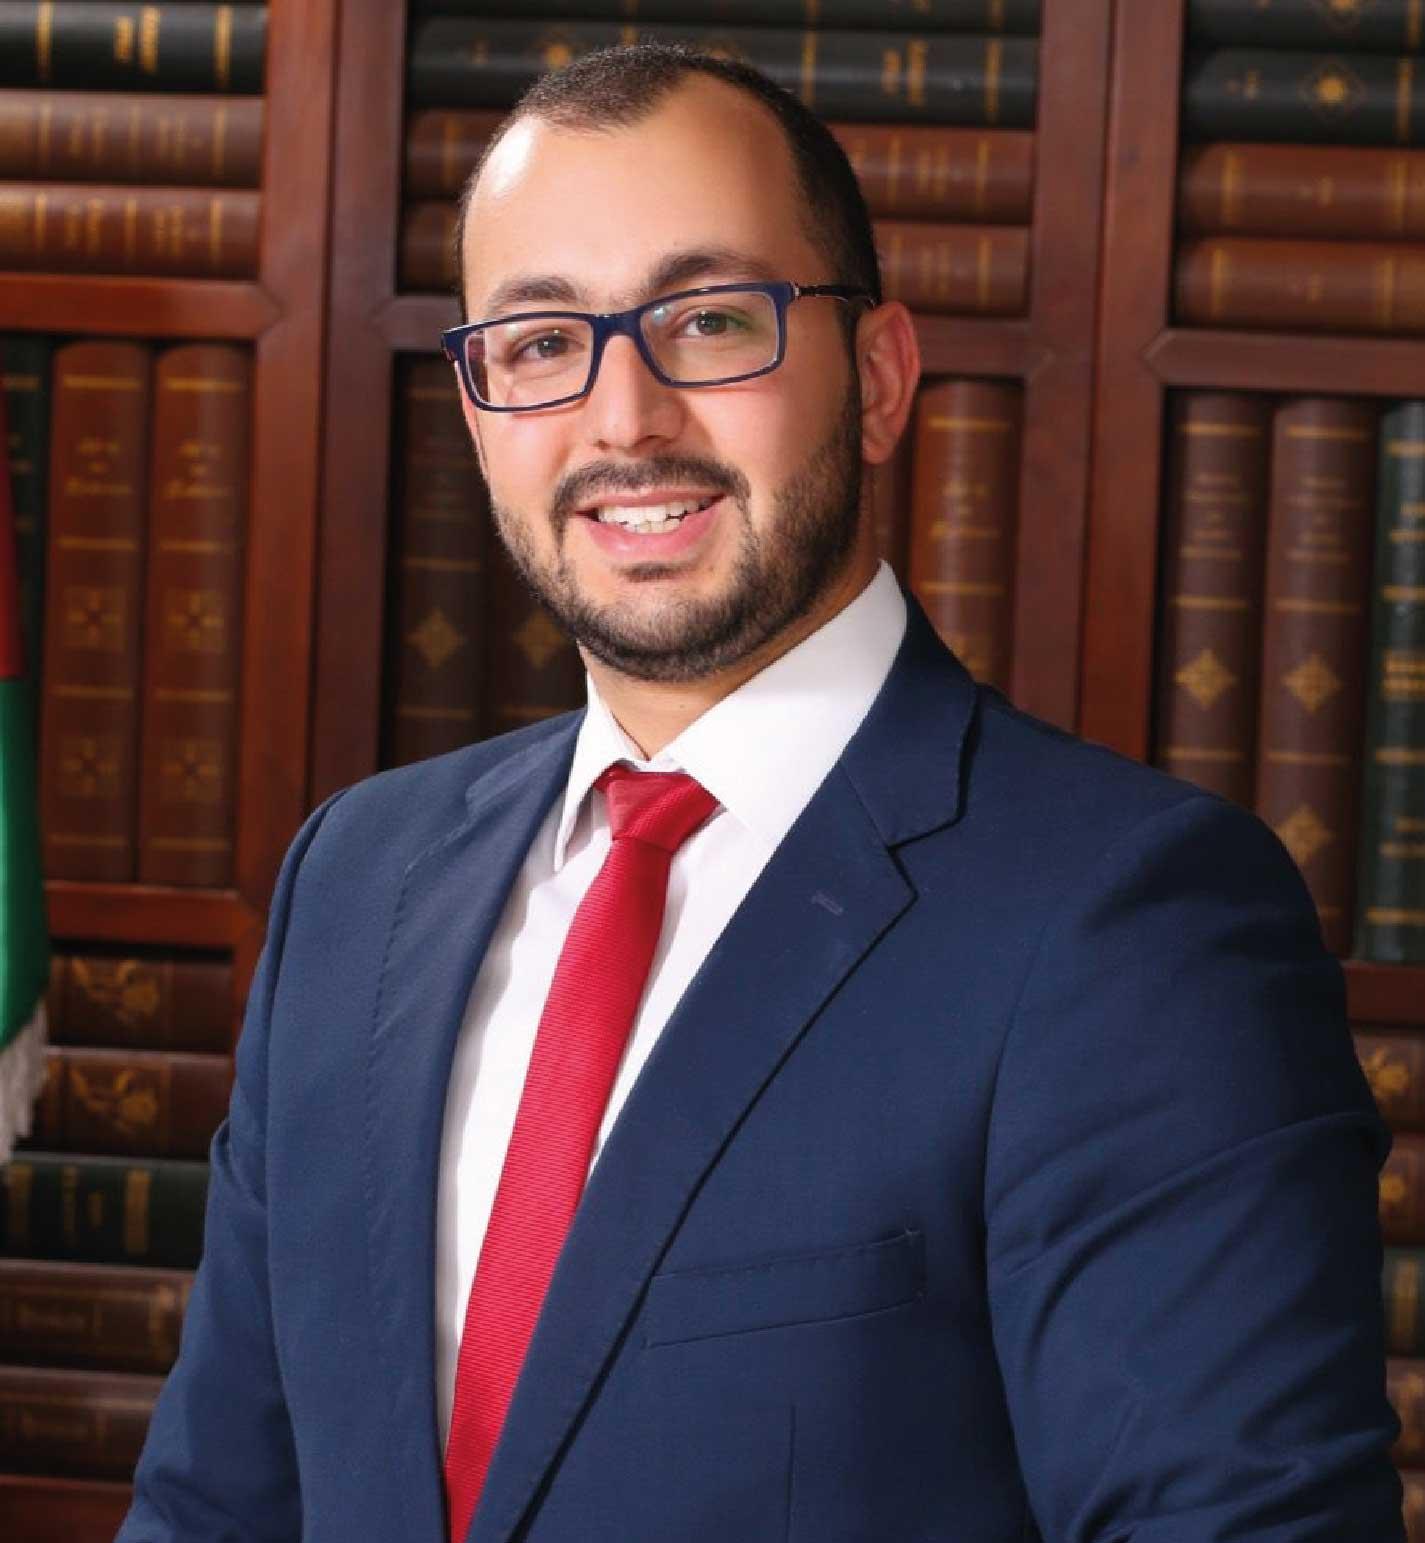 Eng. Zakaria A. Karaman